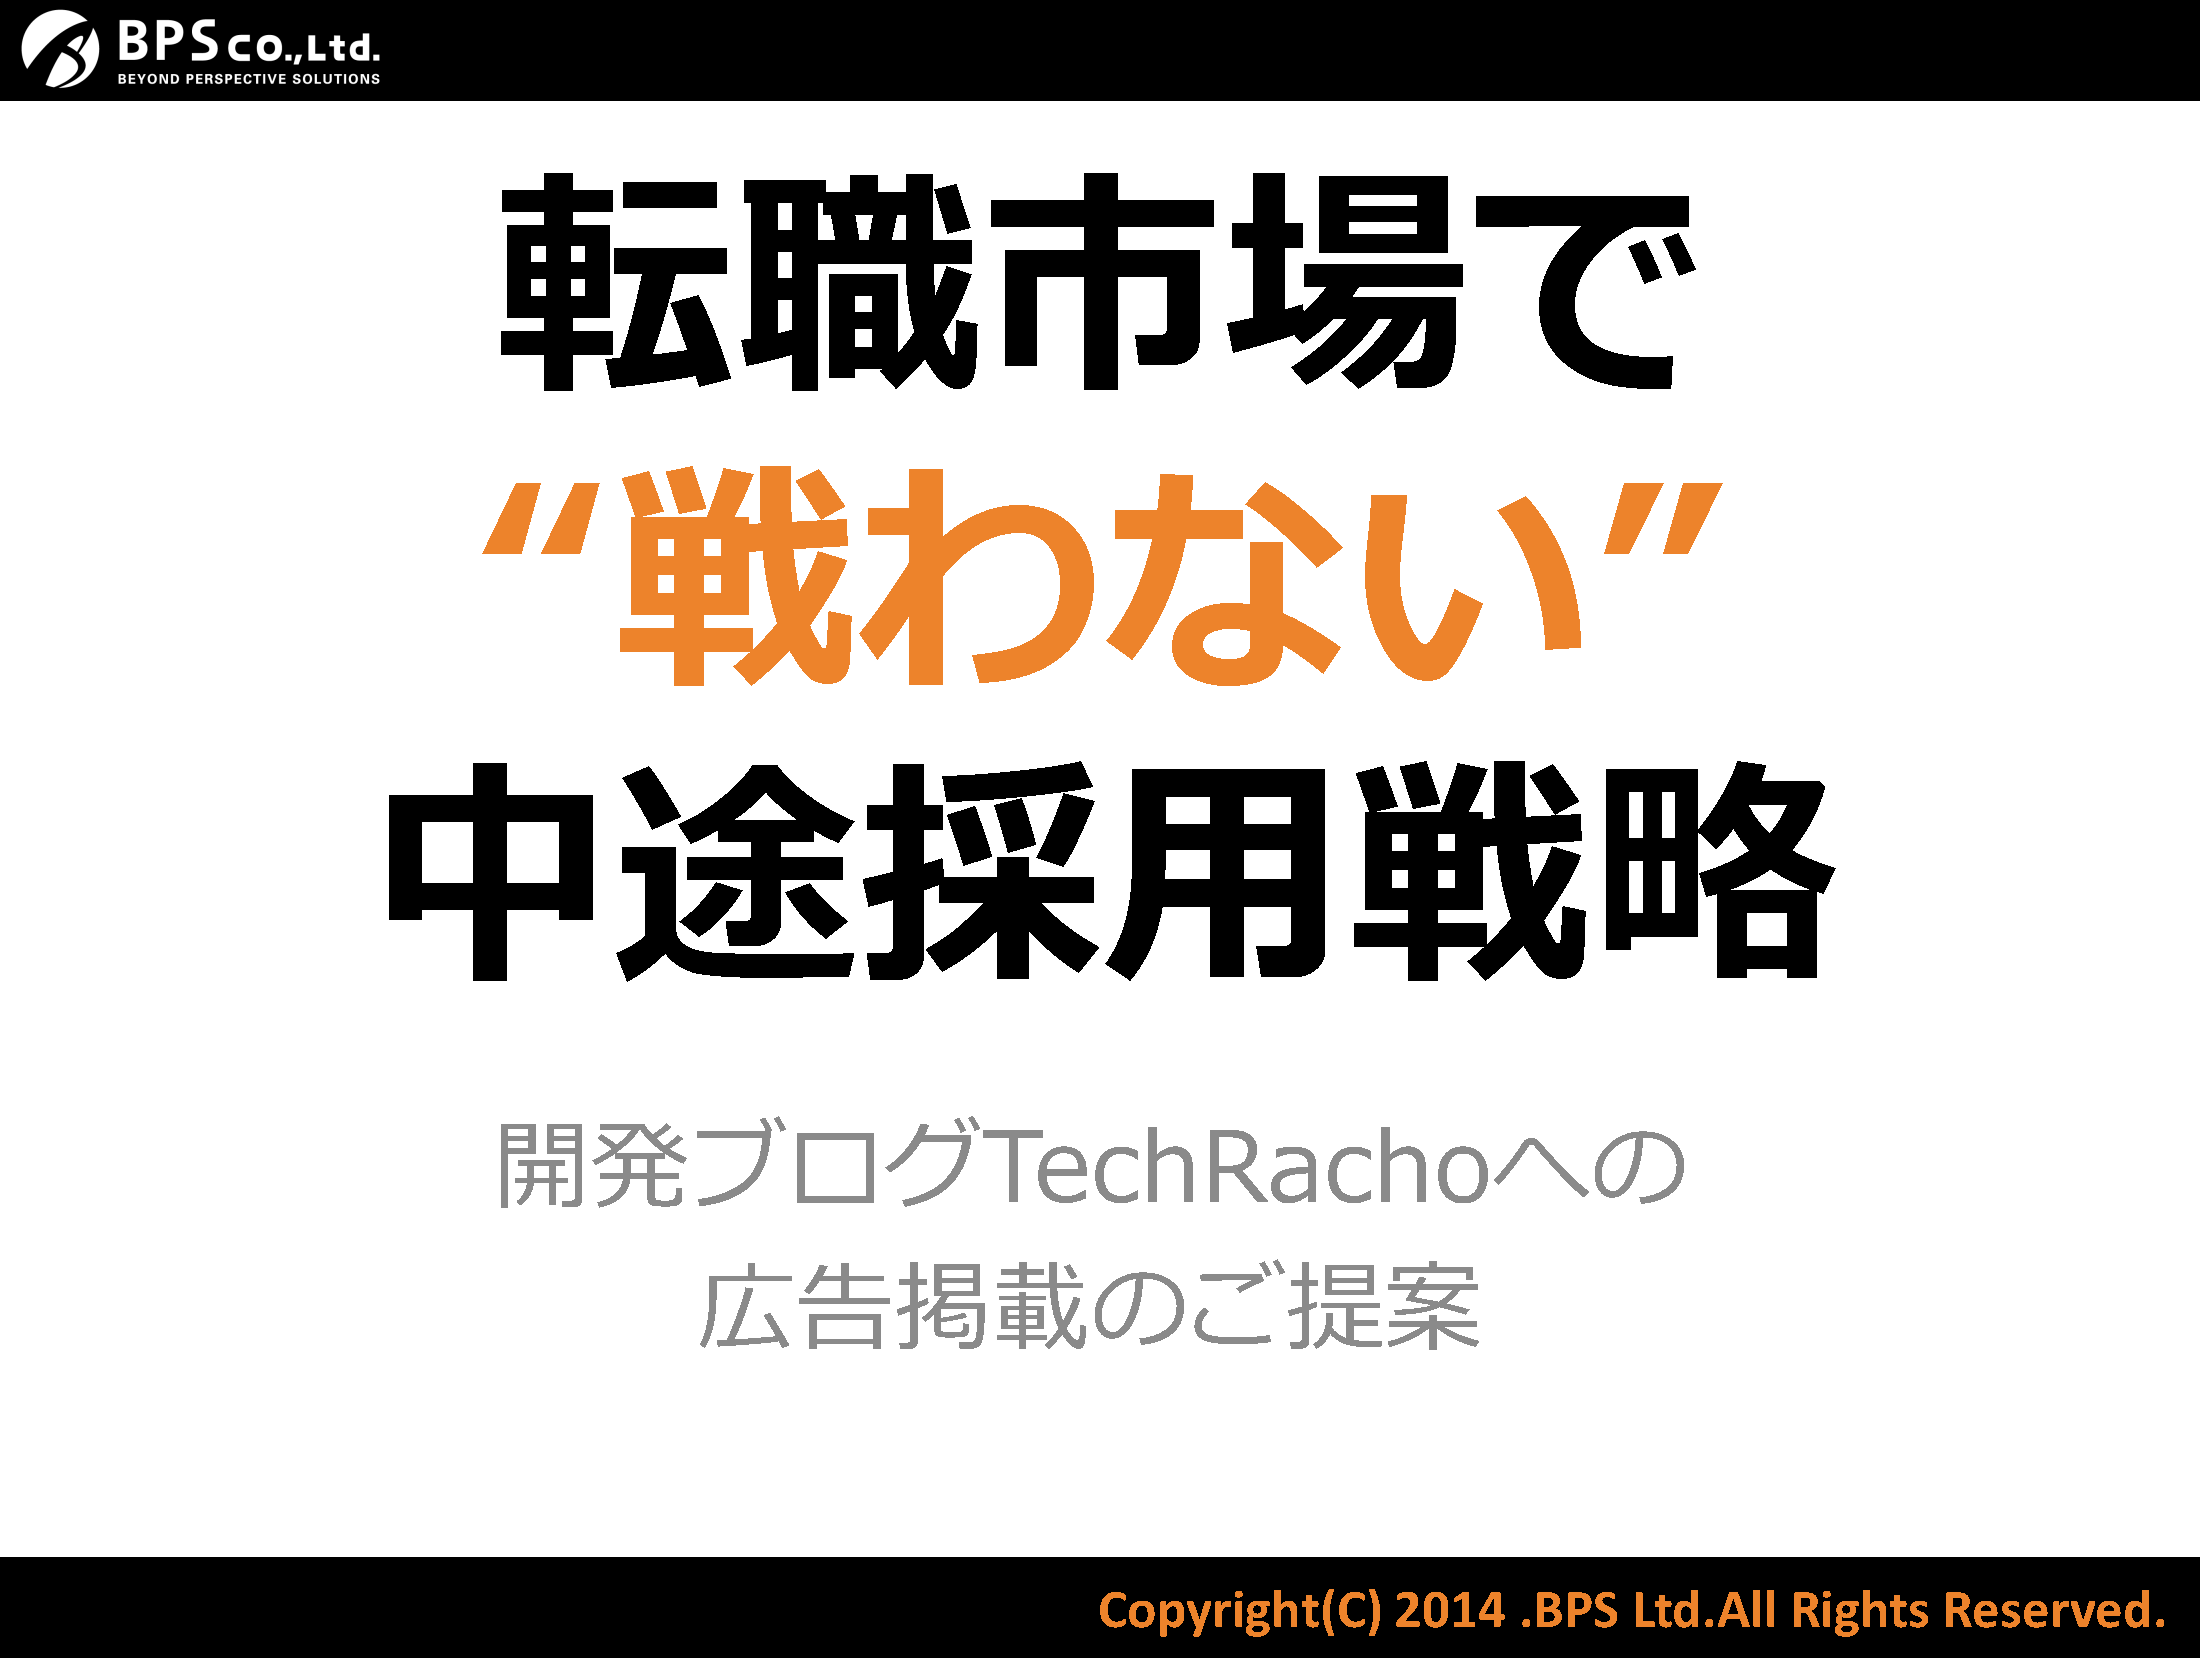 techracho_媒体資料_01